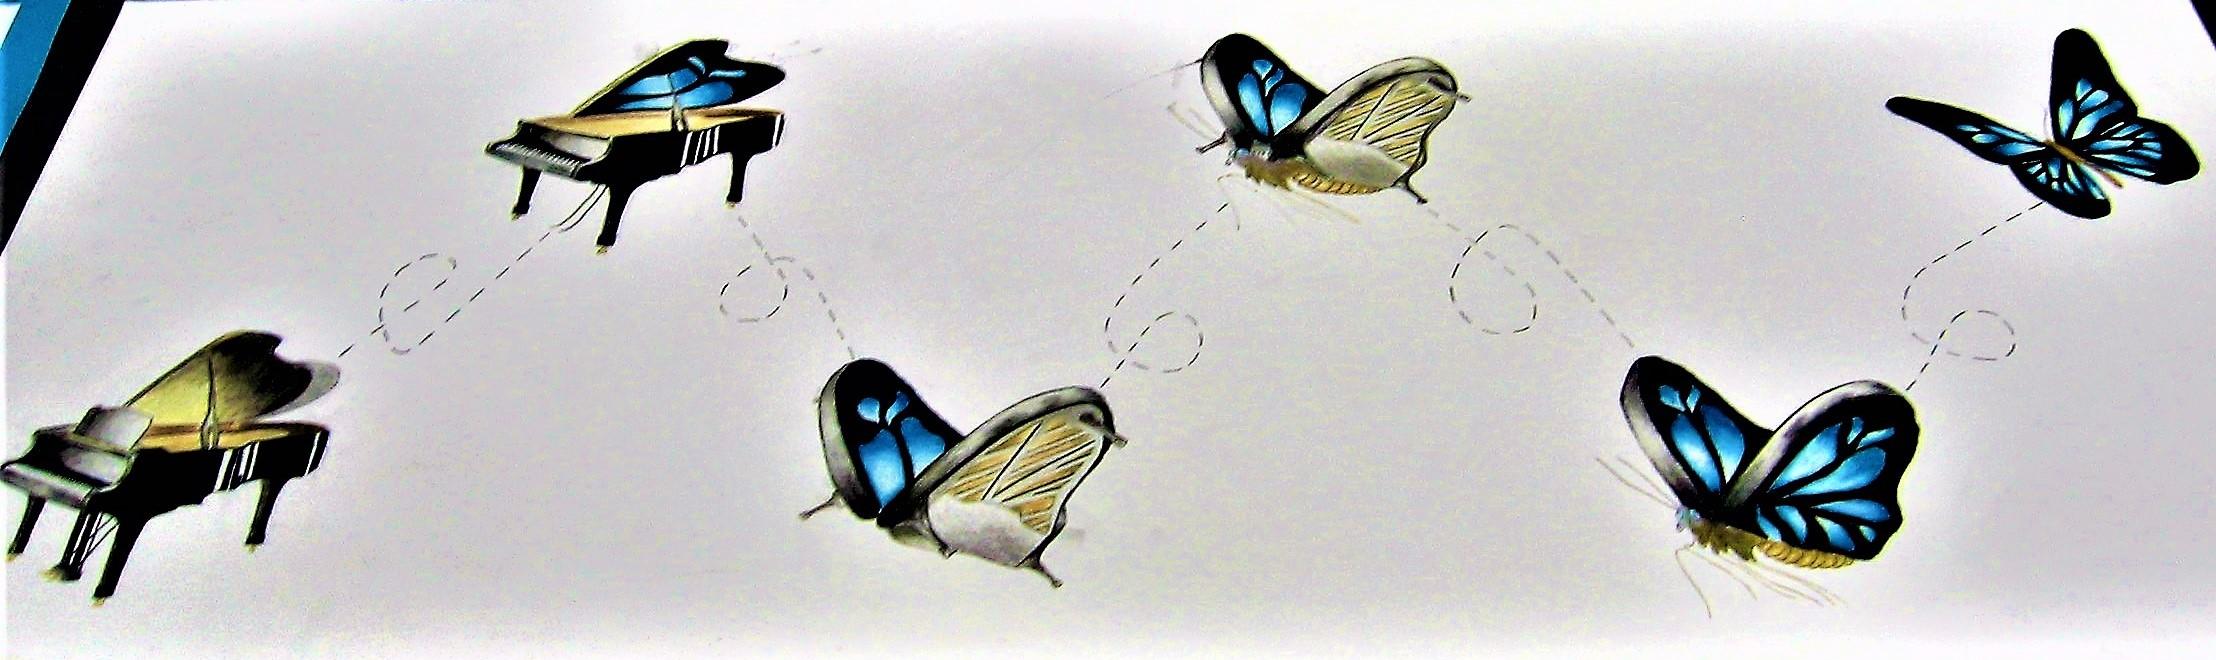 Van vleugel naar vlinder